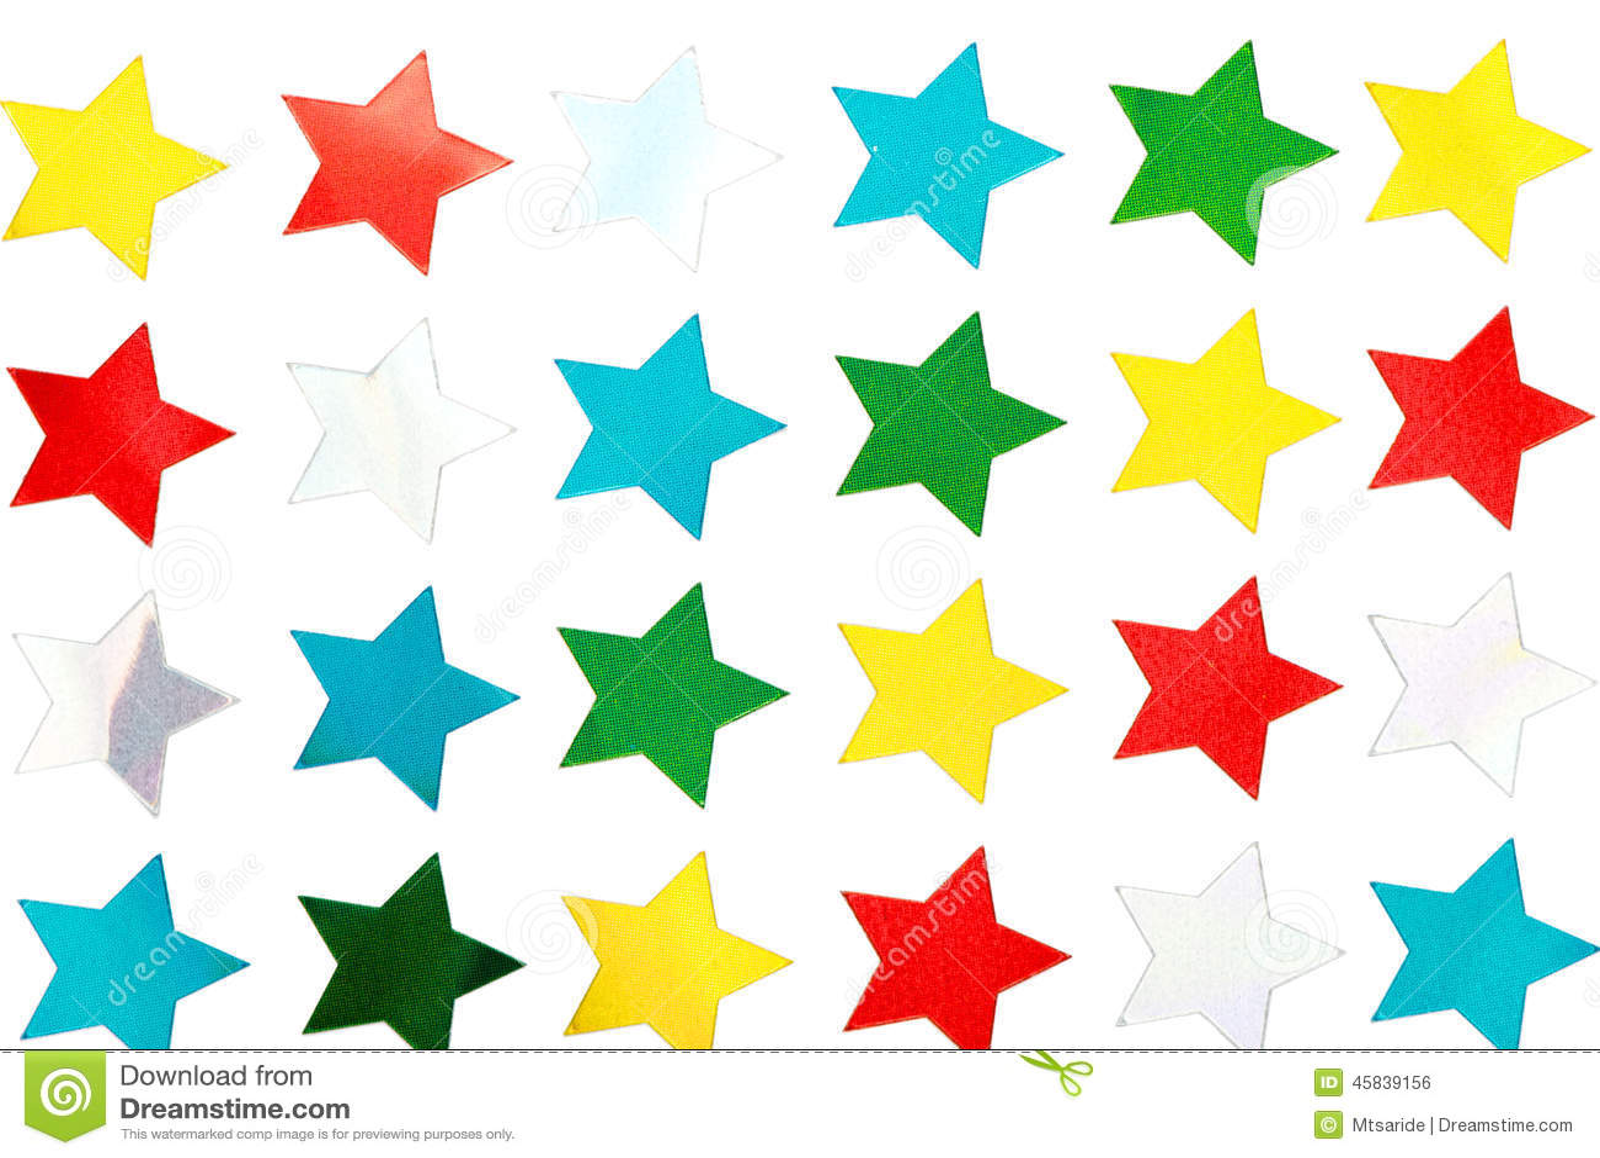 White star stickers